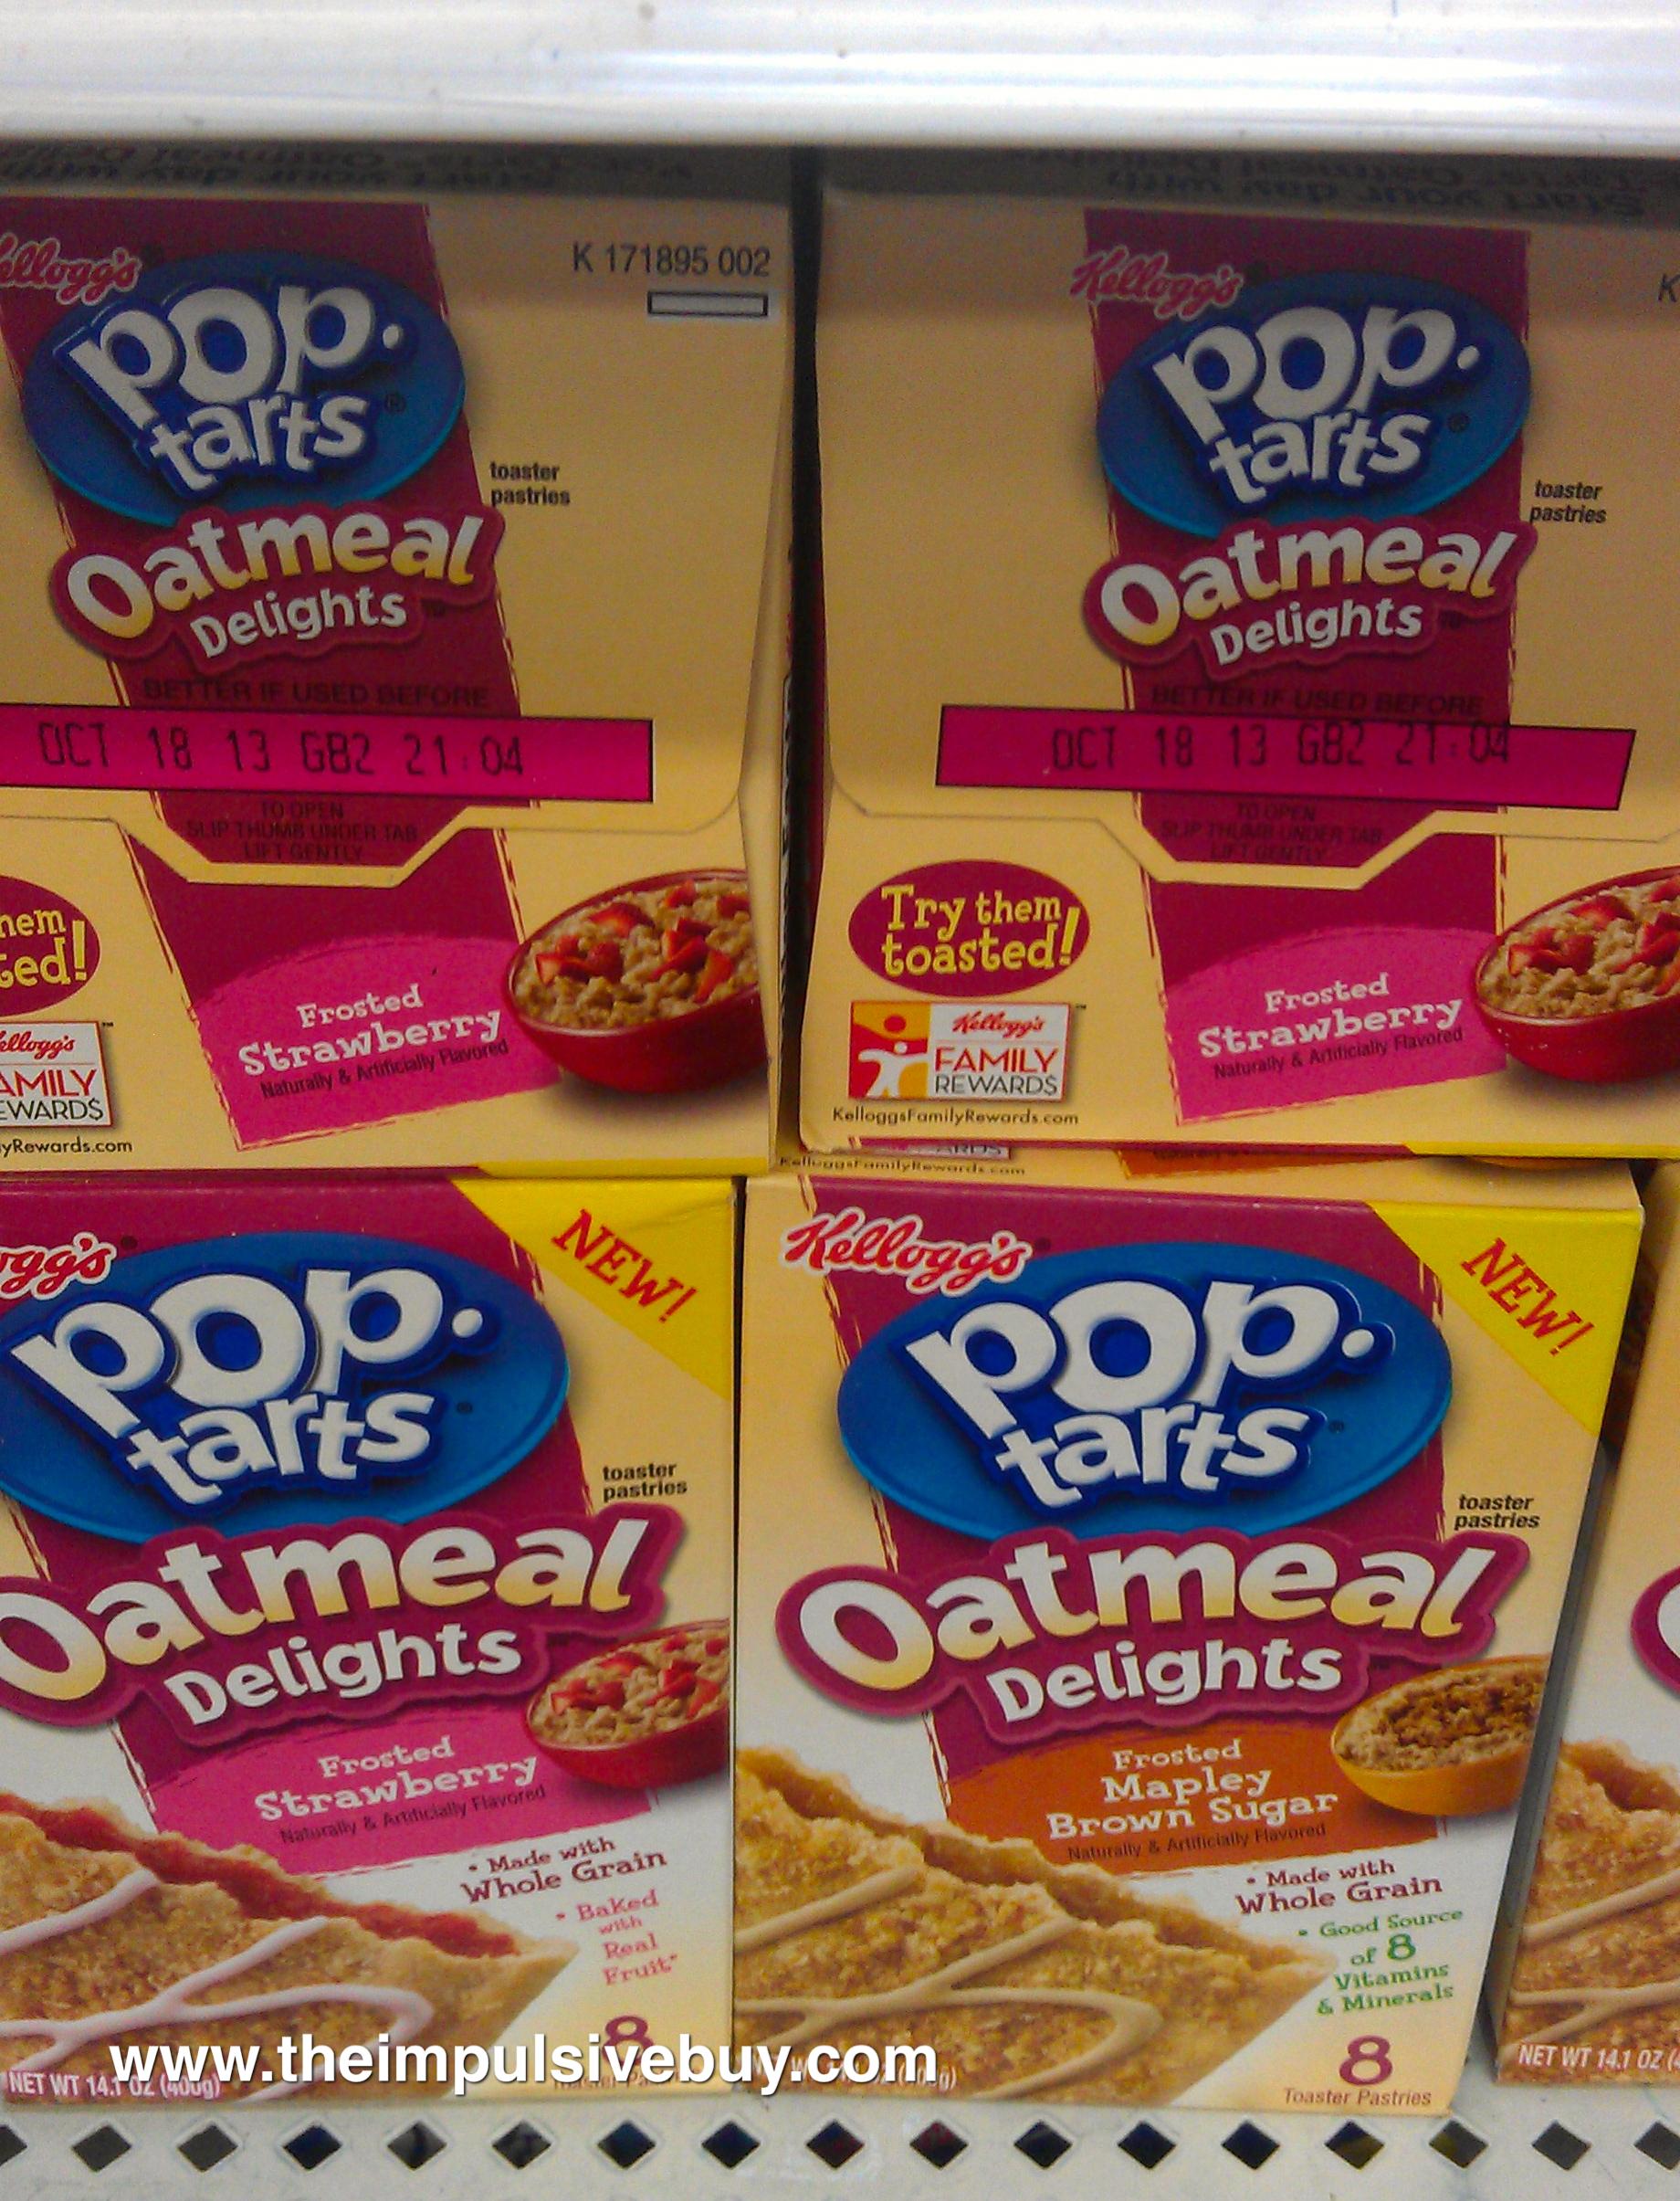 Pop-Tarts Oatmeal Delights | Flickr - Photo Sharing!